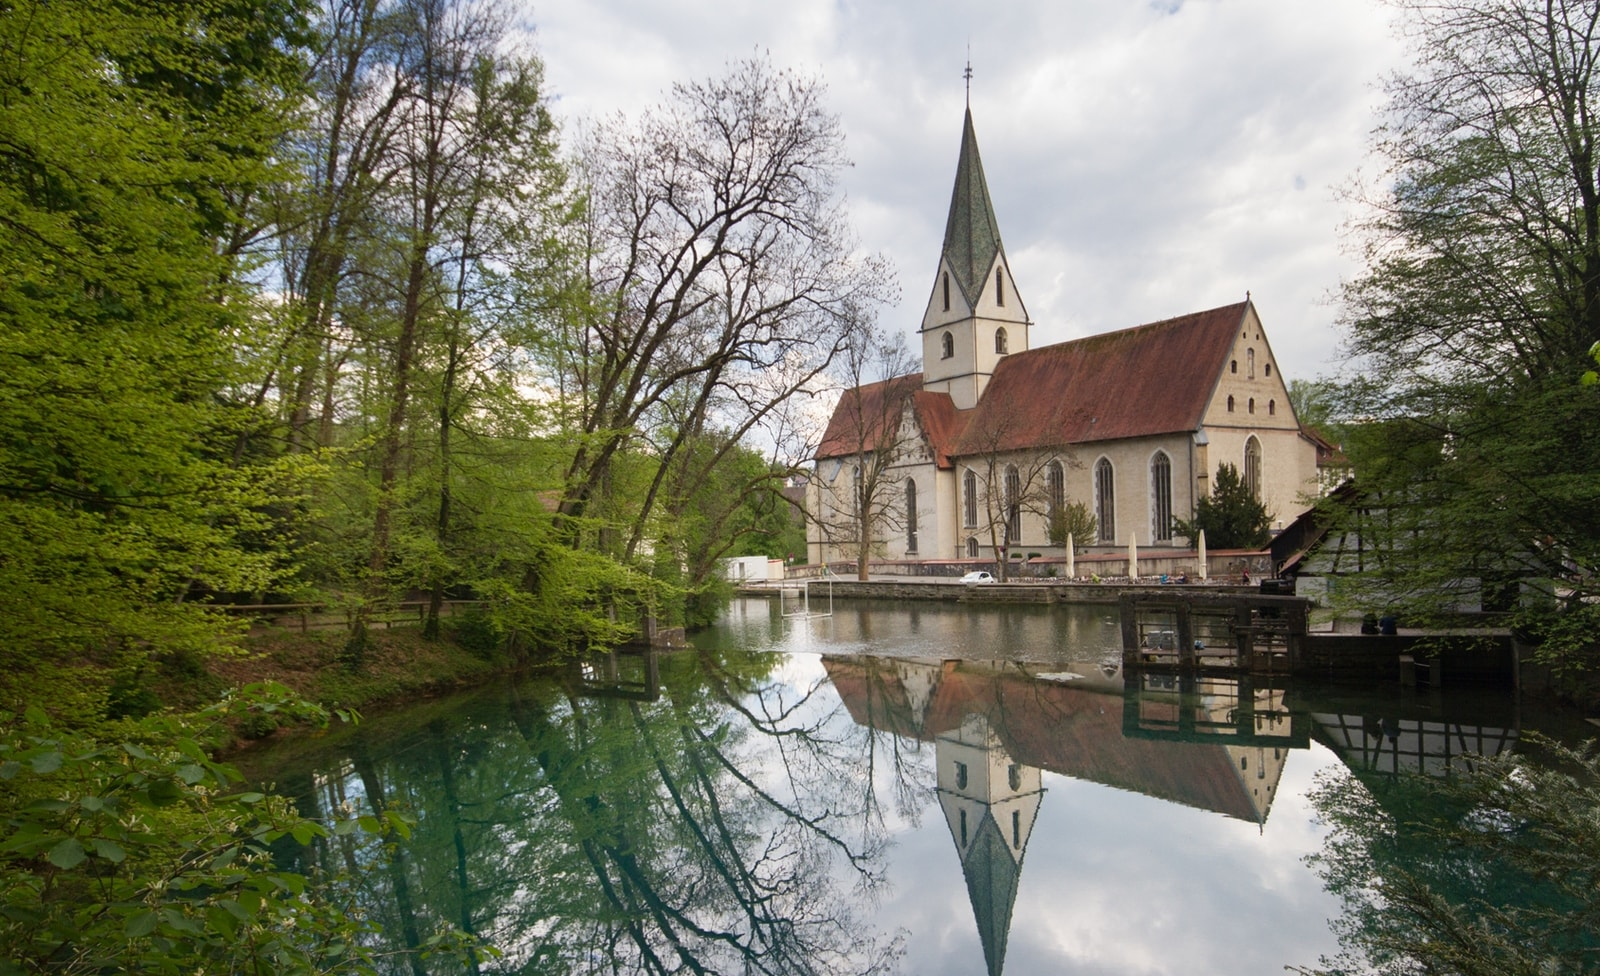 Kloster am Blautopf in Baden-Württemberg